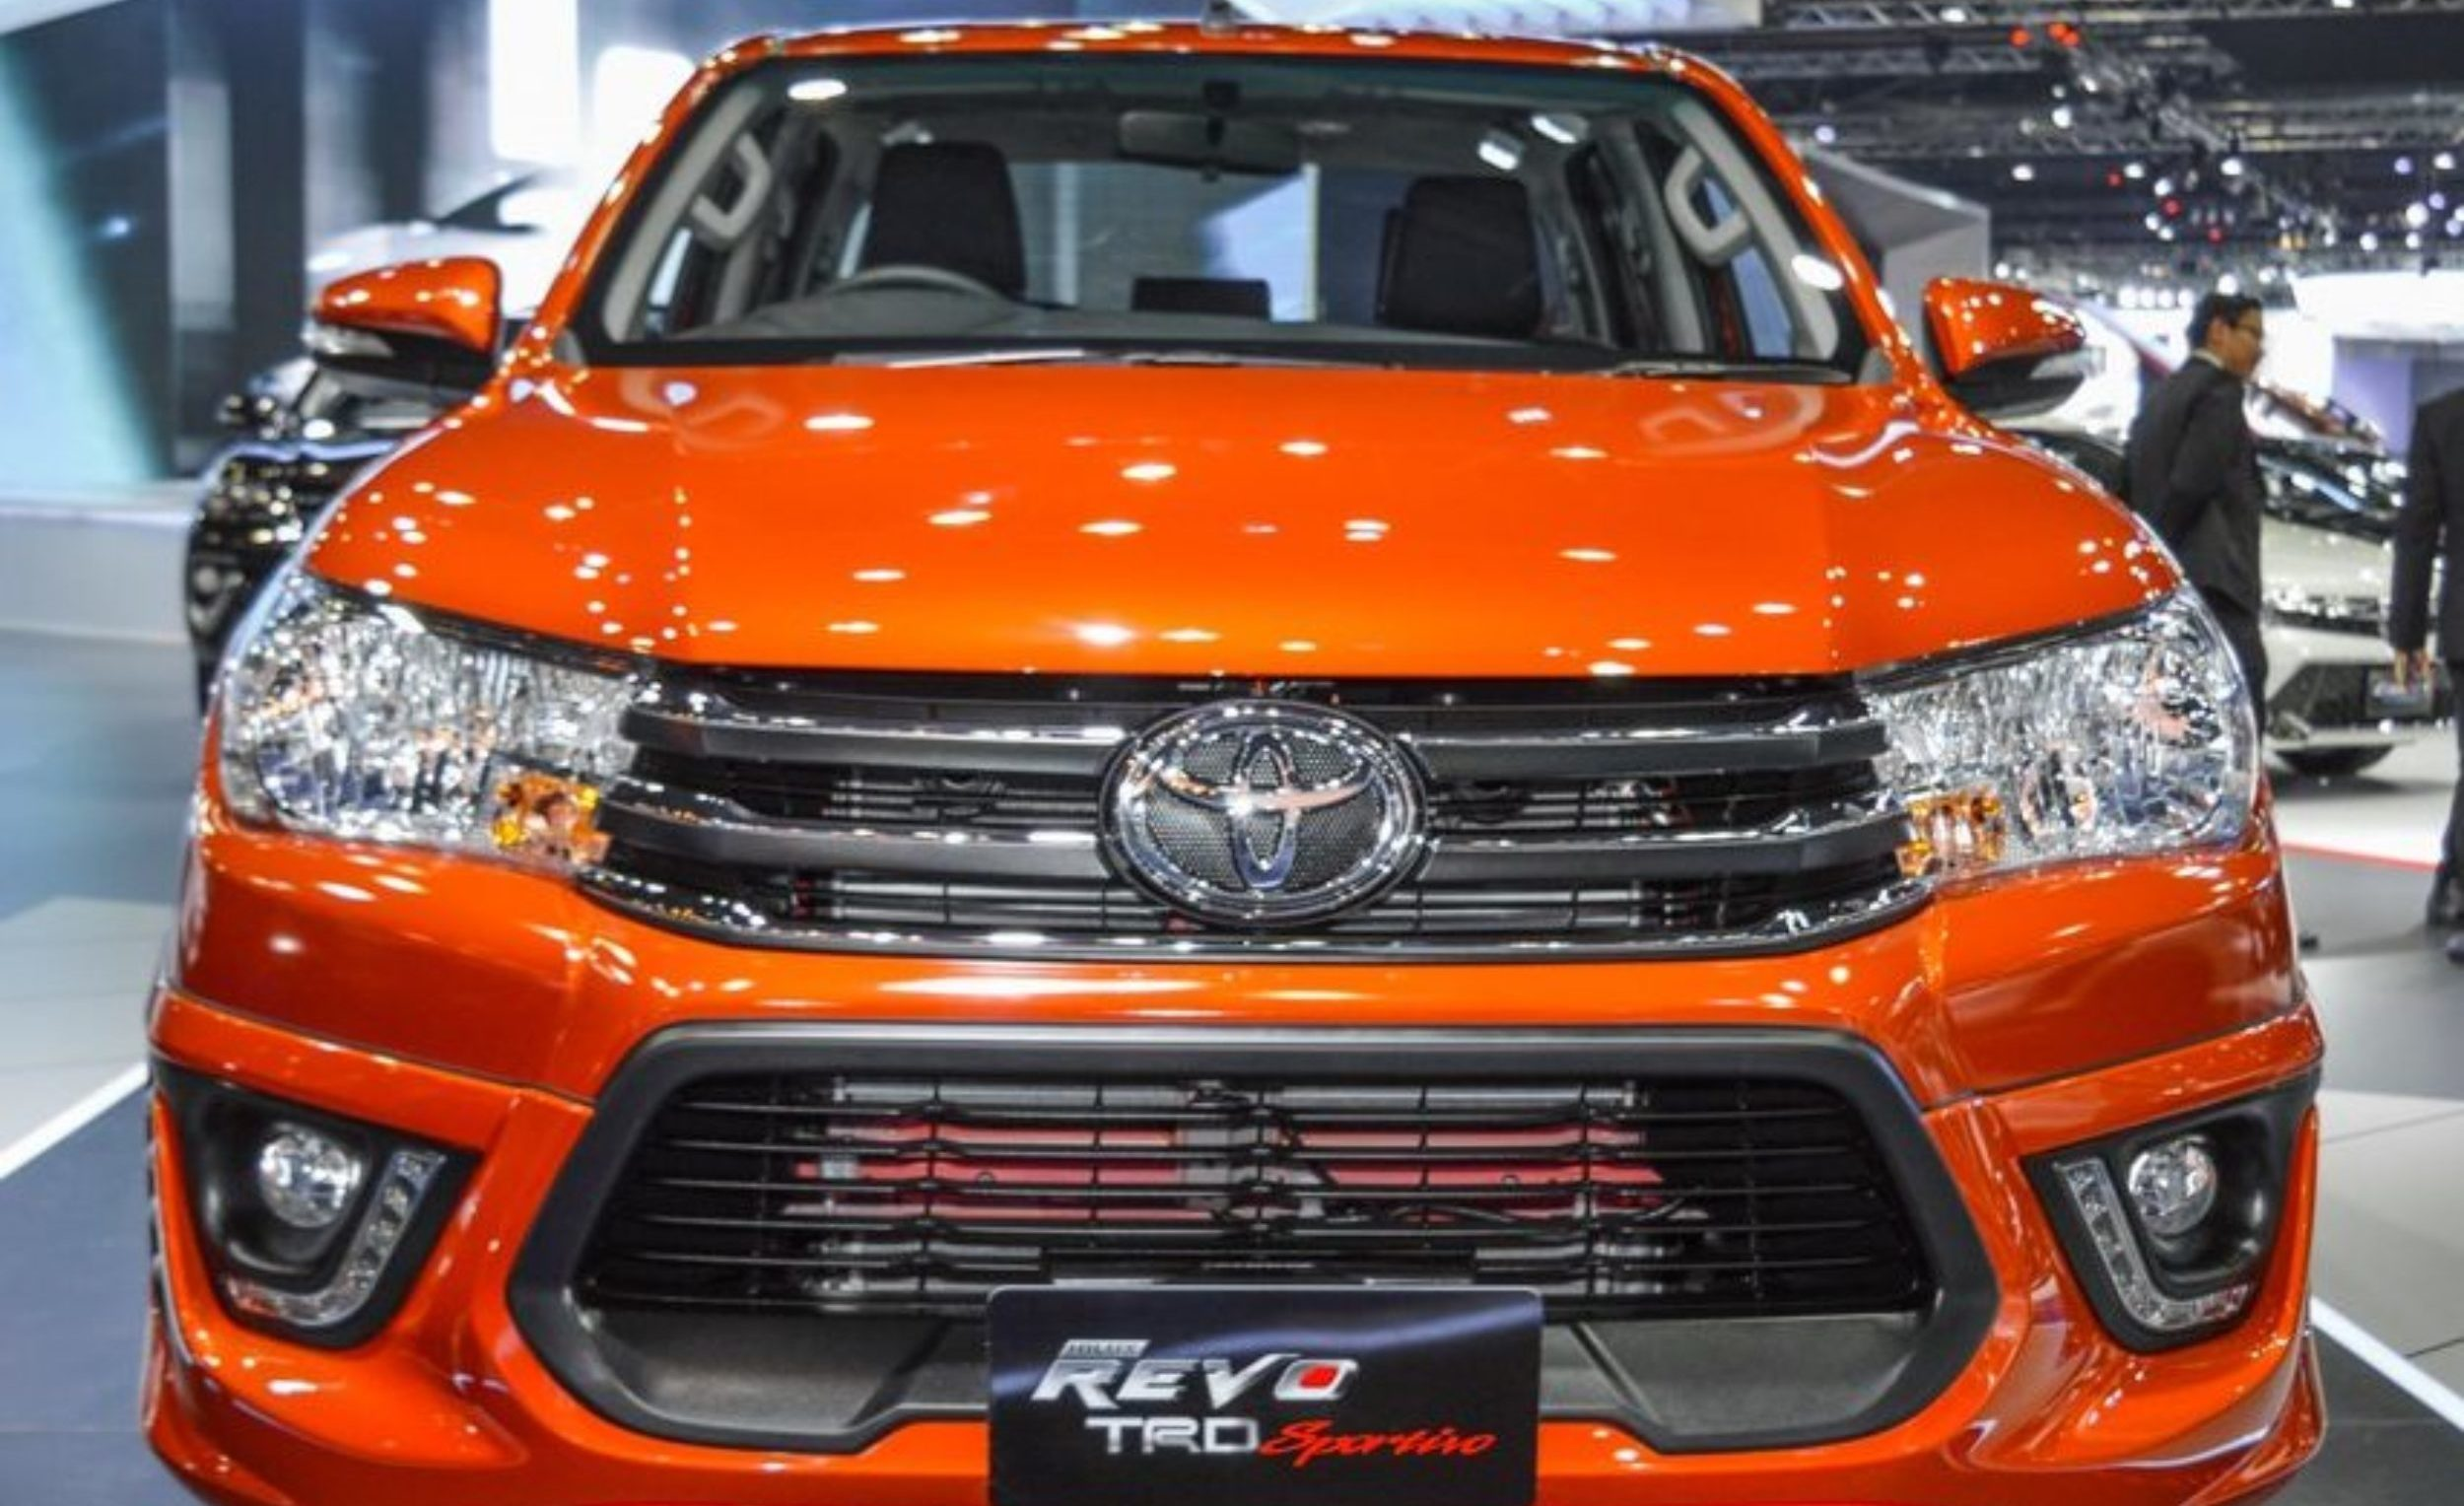 Thailand Toyota Hilux Revo Dealer Exporter